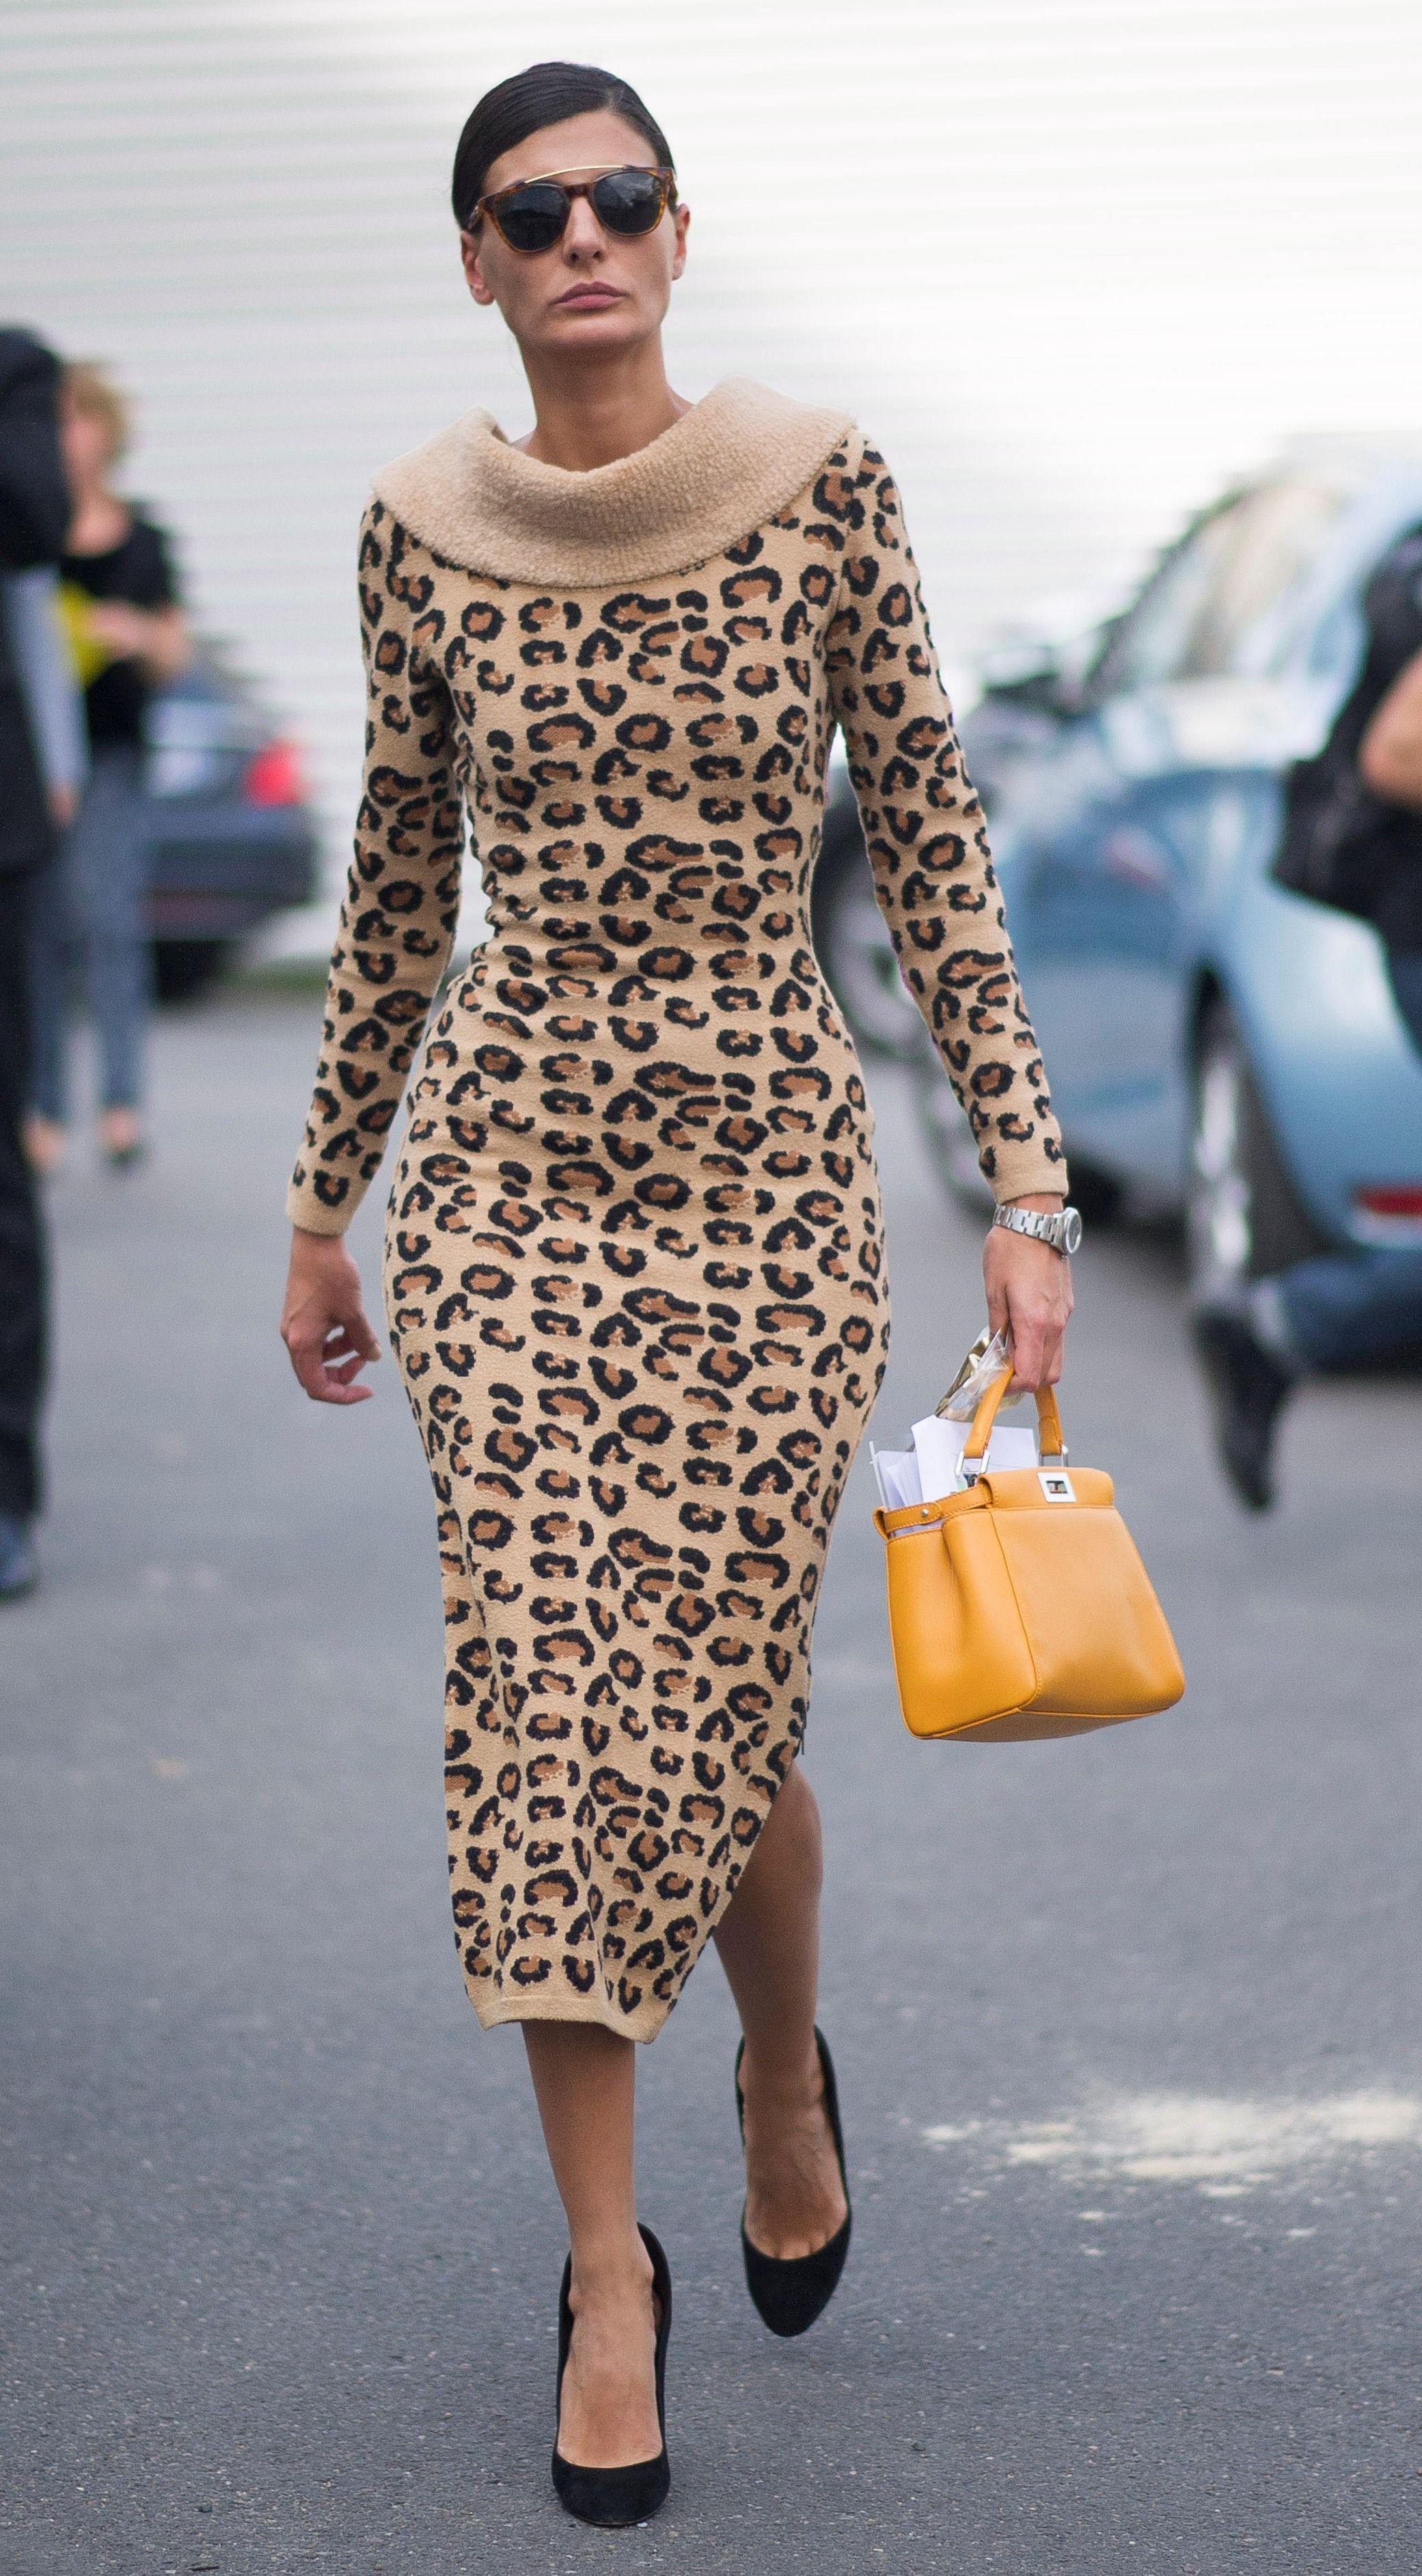 b96f922062 Giovanna Battaglia paired her 1991 leopard print dress from Azzedine  Alaia with an adorable yellow Fendi Mini Peekaboo leather bag at the  Paris Fashion ...